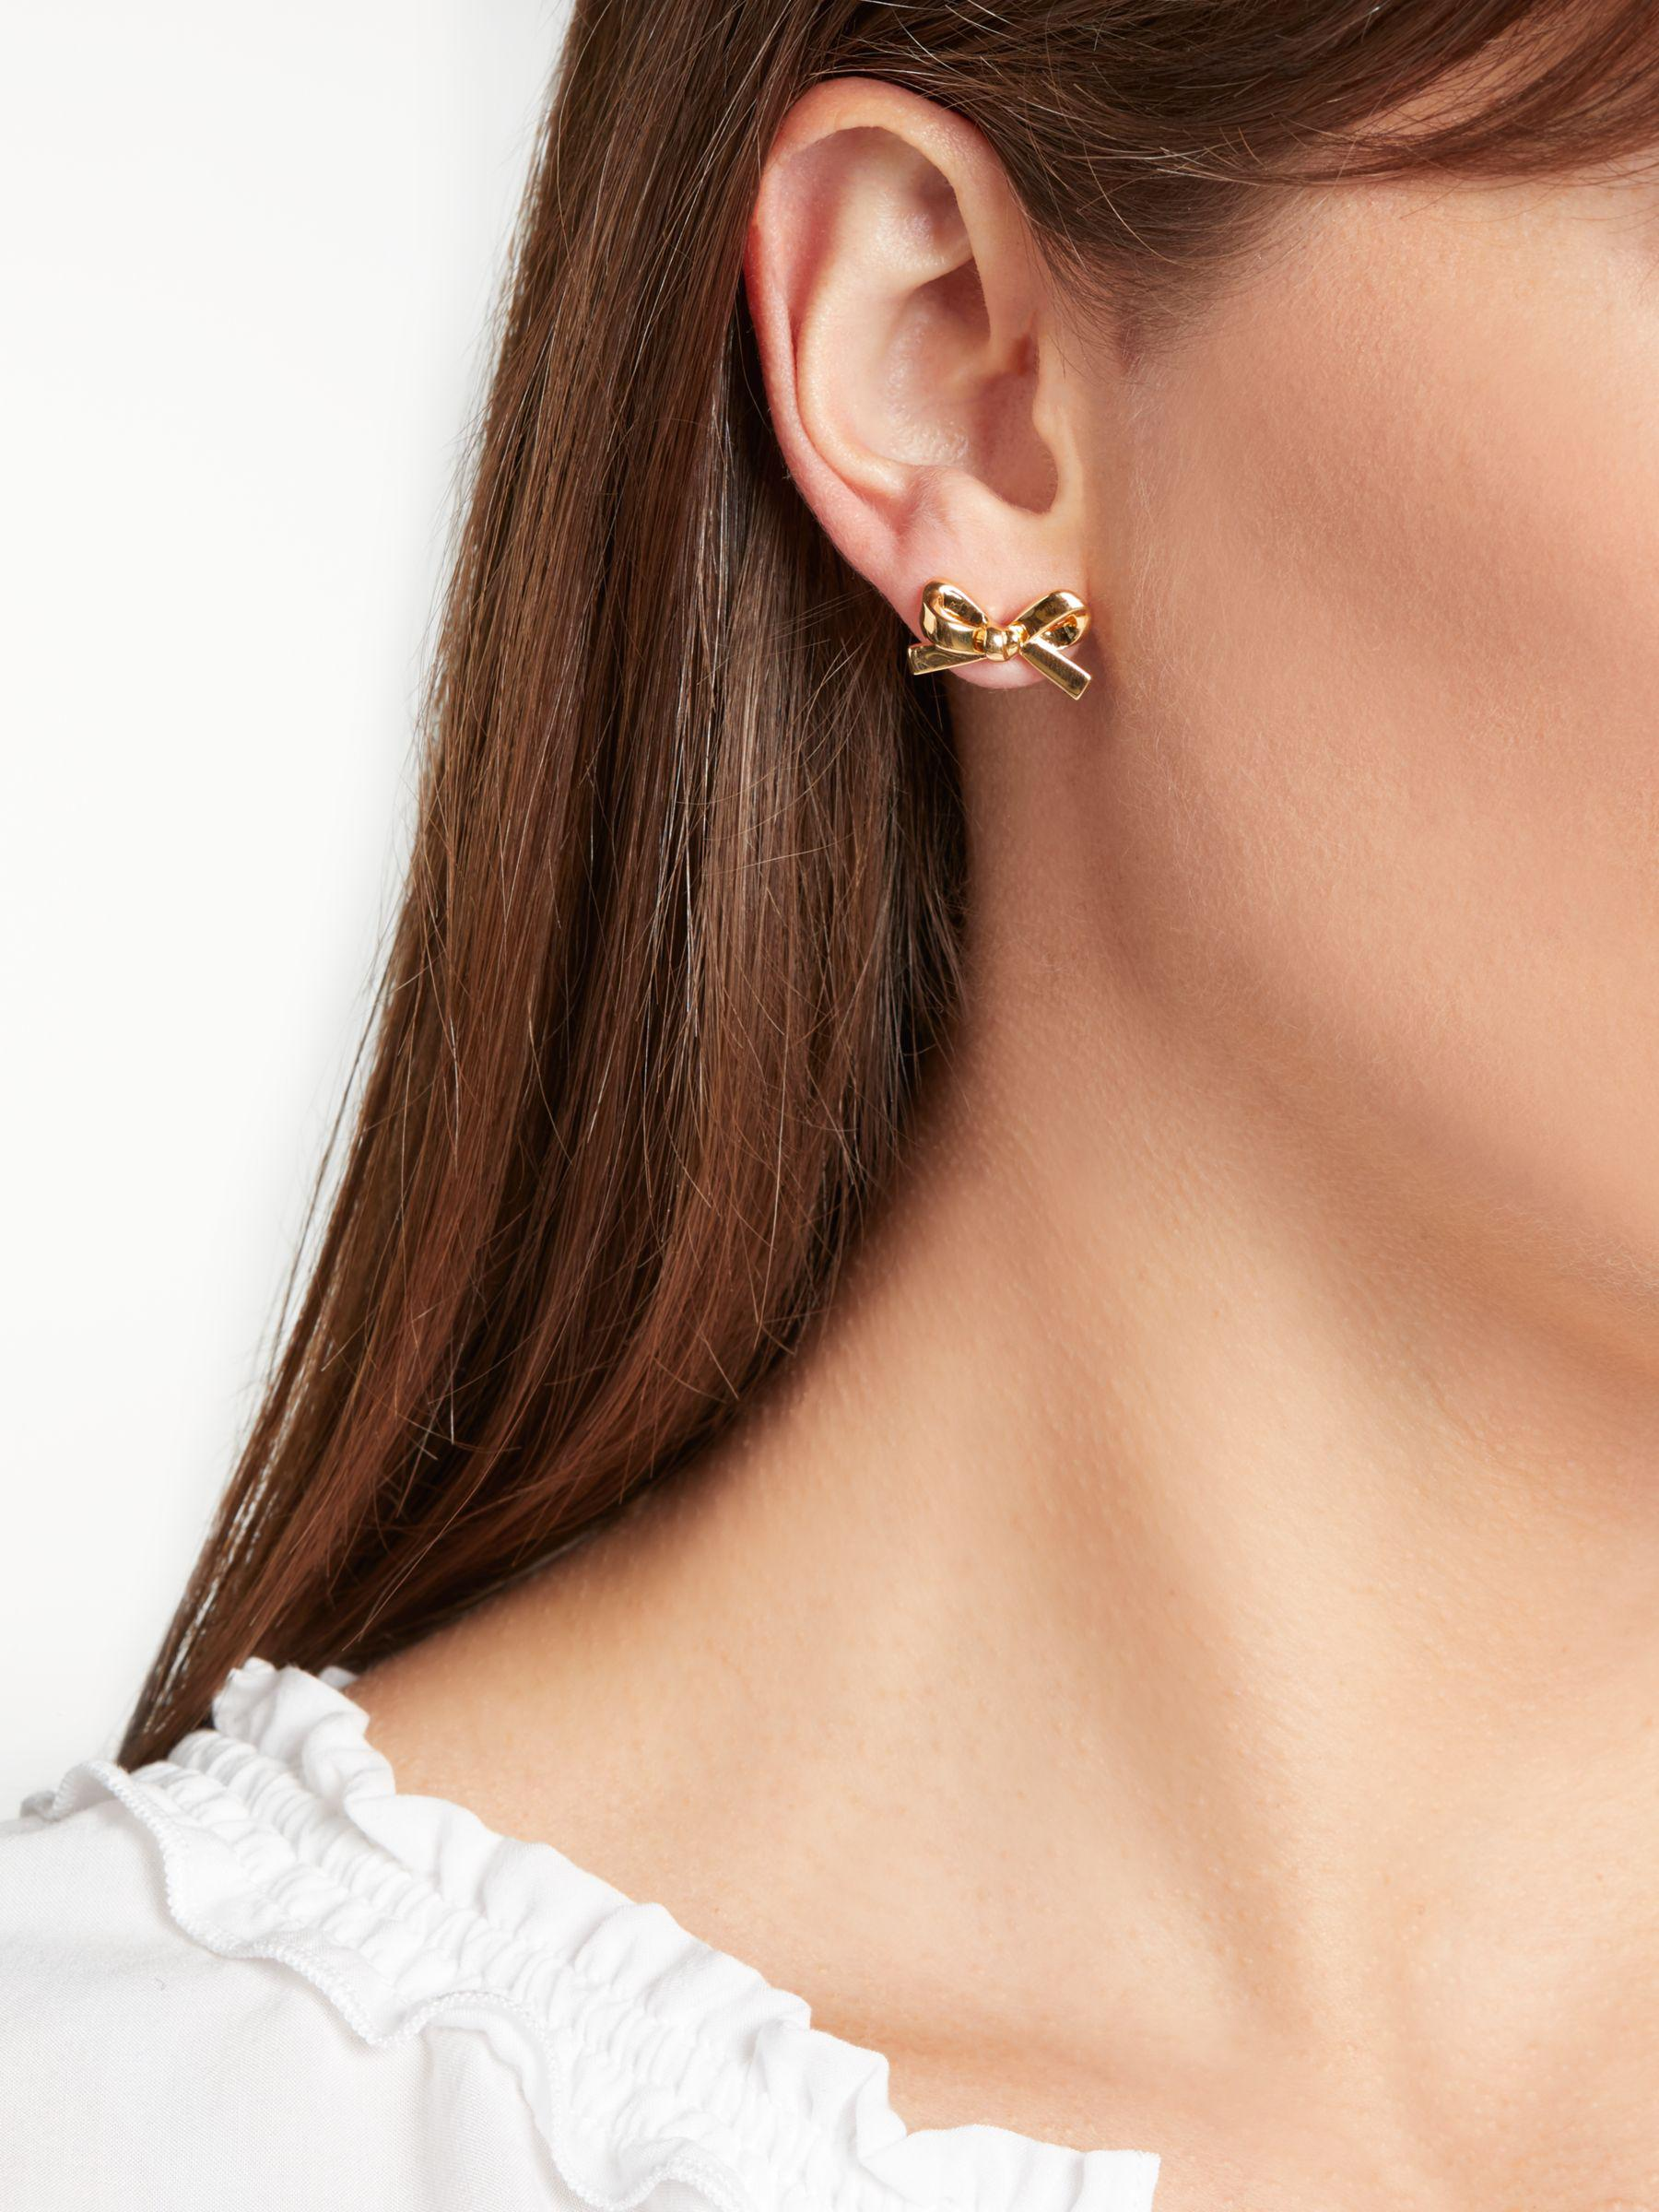 Kate Spade Bow Stud in Gold (Metallic)